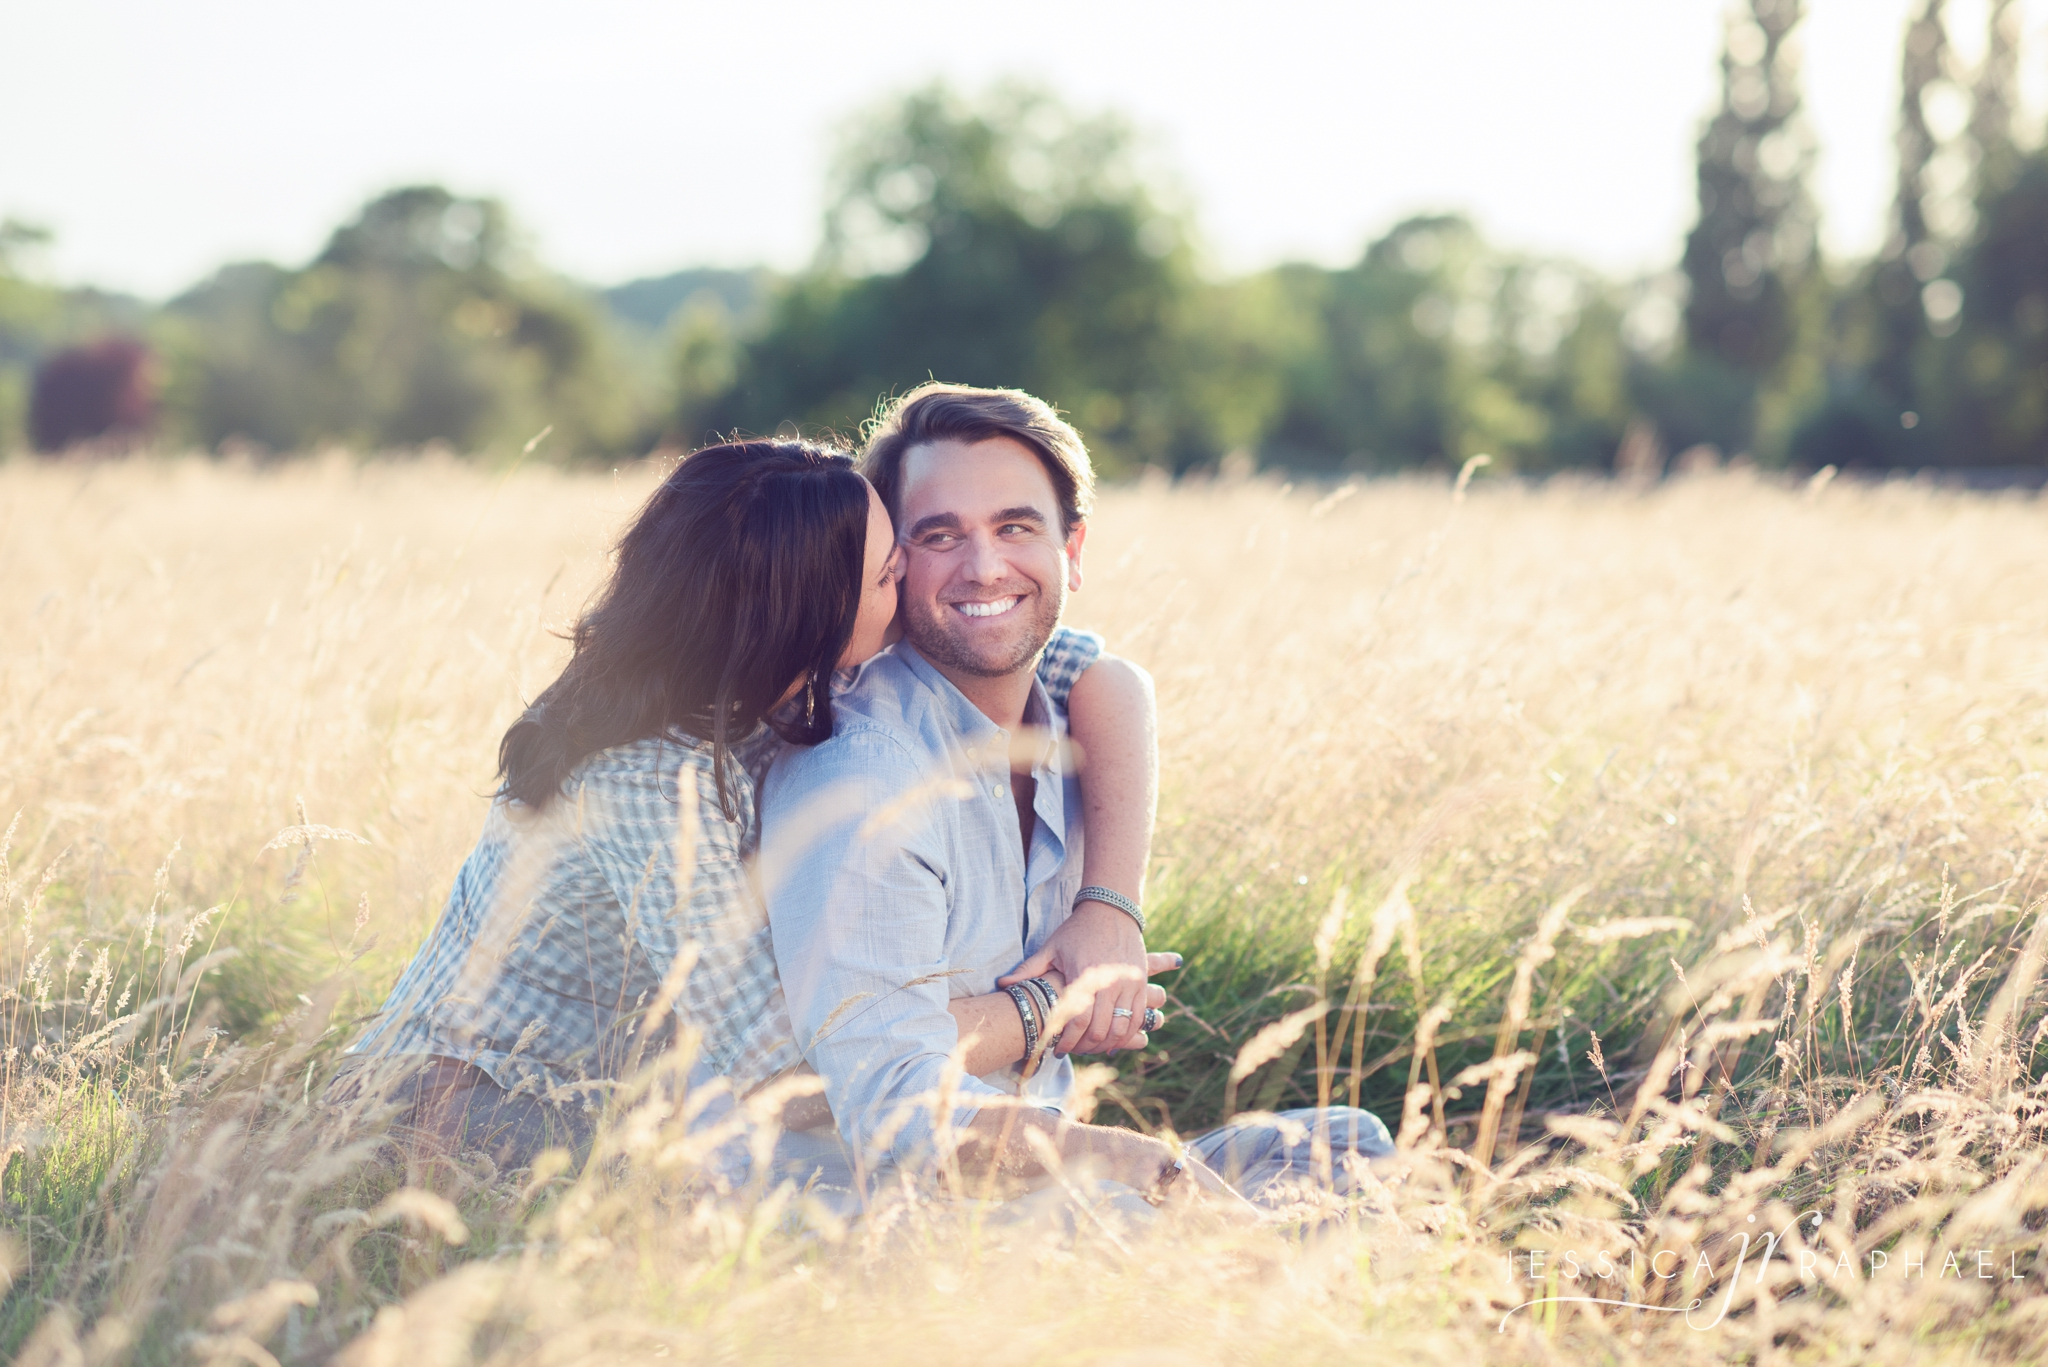 kate-hopewell-smith-engagement-photography-buckinghamshire-wedding-photographer-buckingham-jessica-raphael-photography